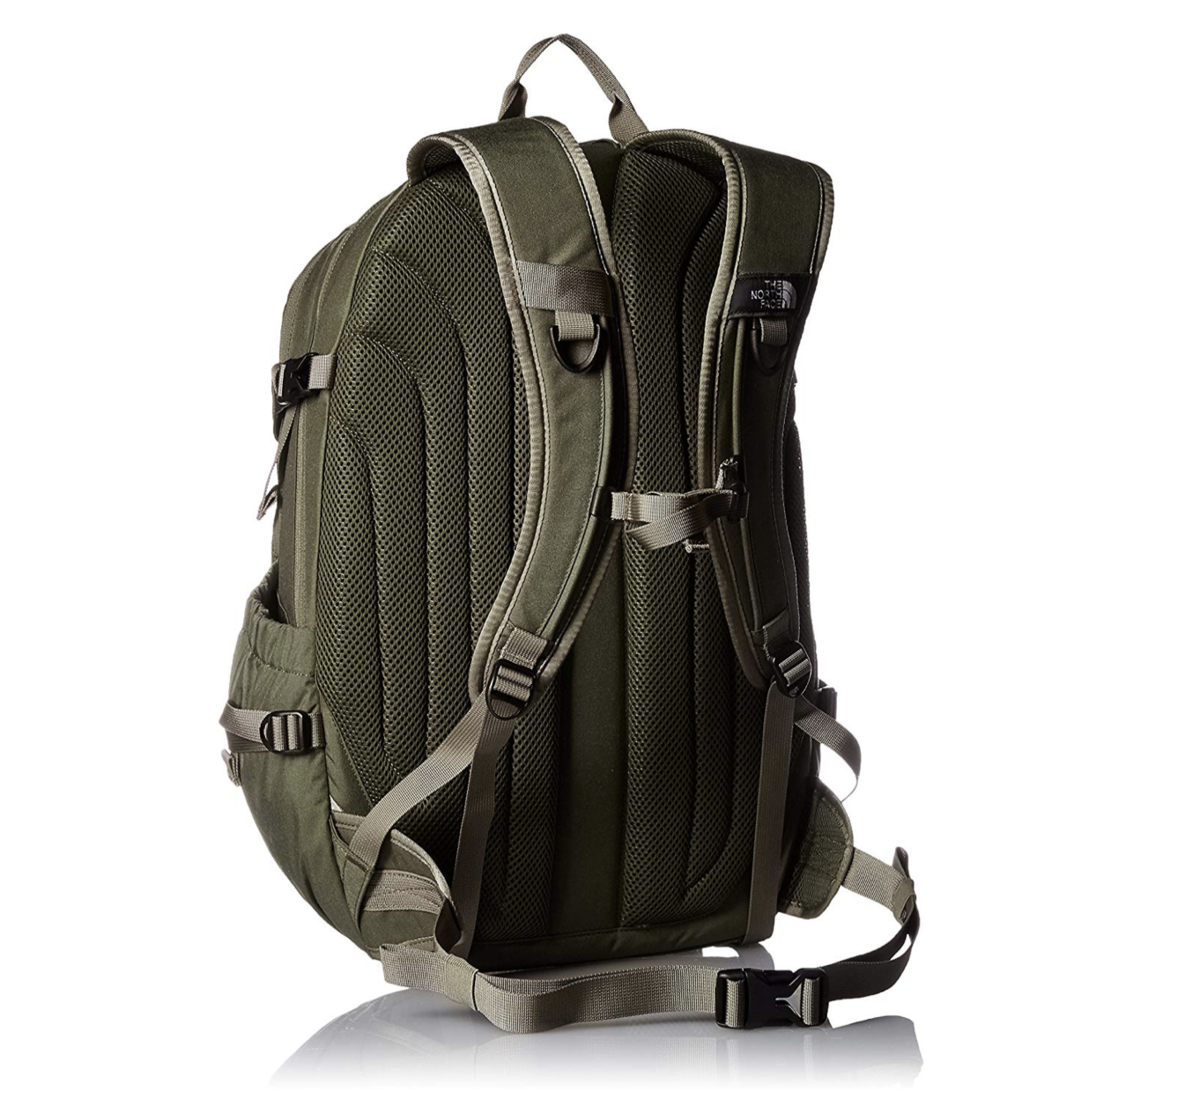 f:id:thebackpack:20190329192557p:plain